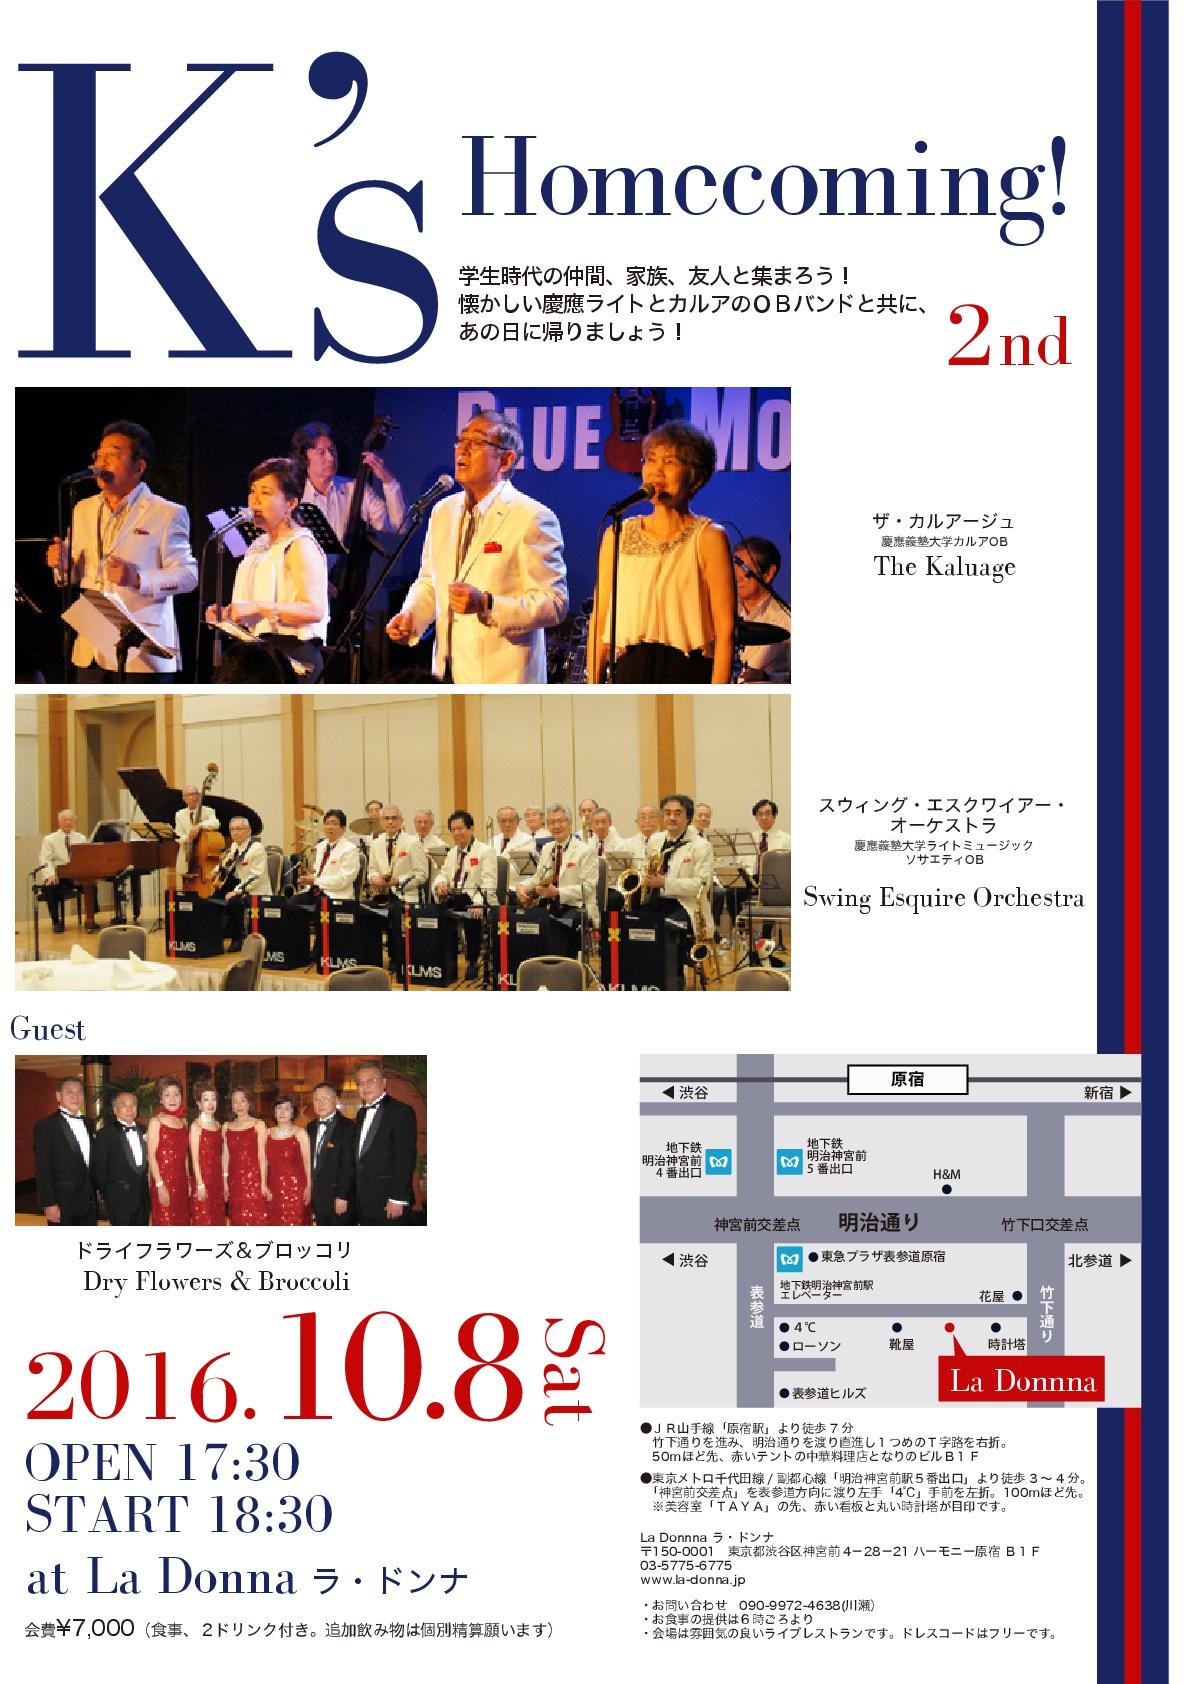 K`s Homecoming!